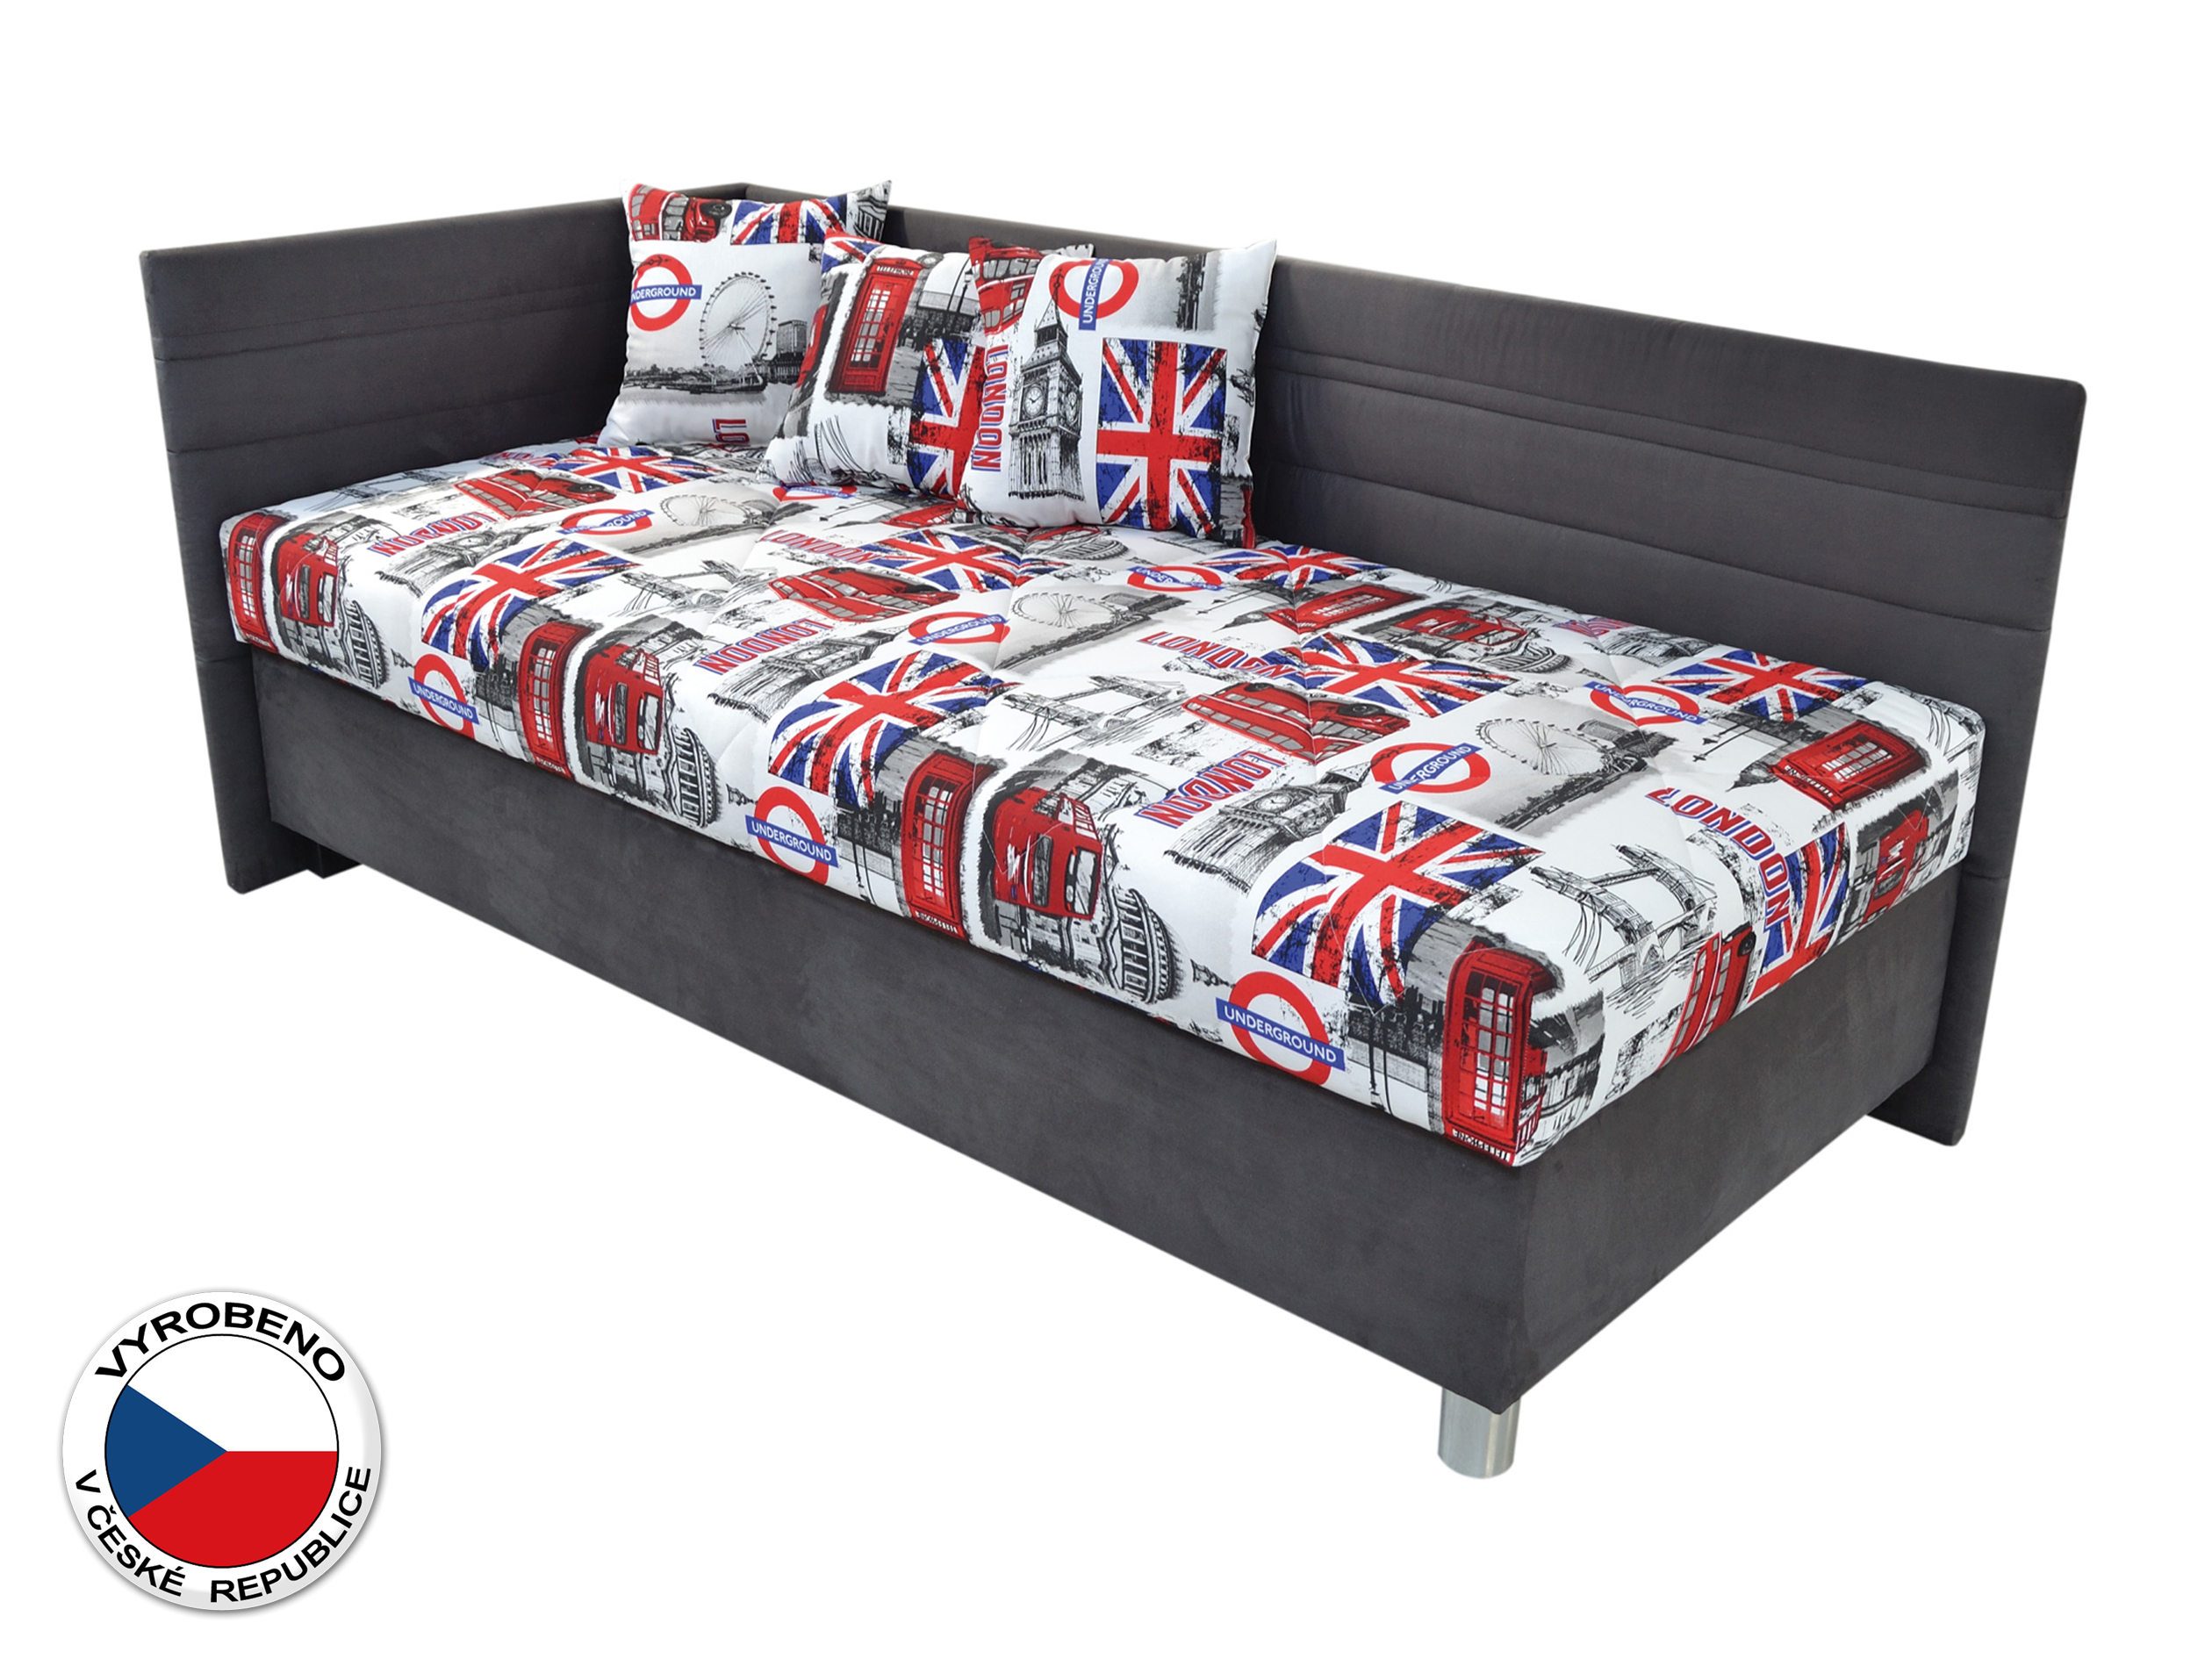 Jednolůžková postel 120 cm - Blanář - Polly (bílá + šedá) (s roštem a matrací) (L)